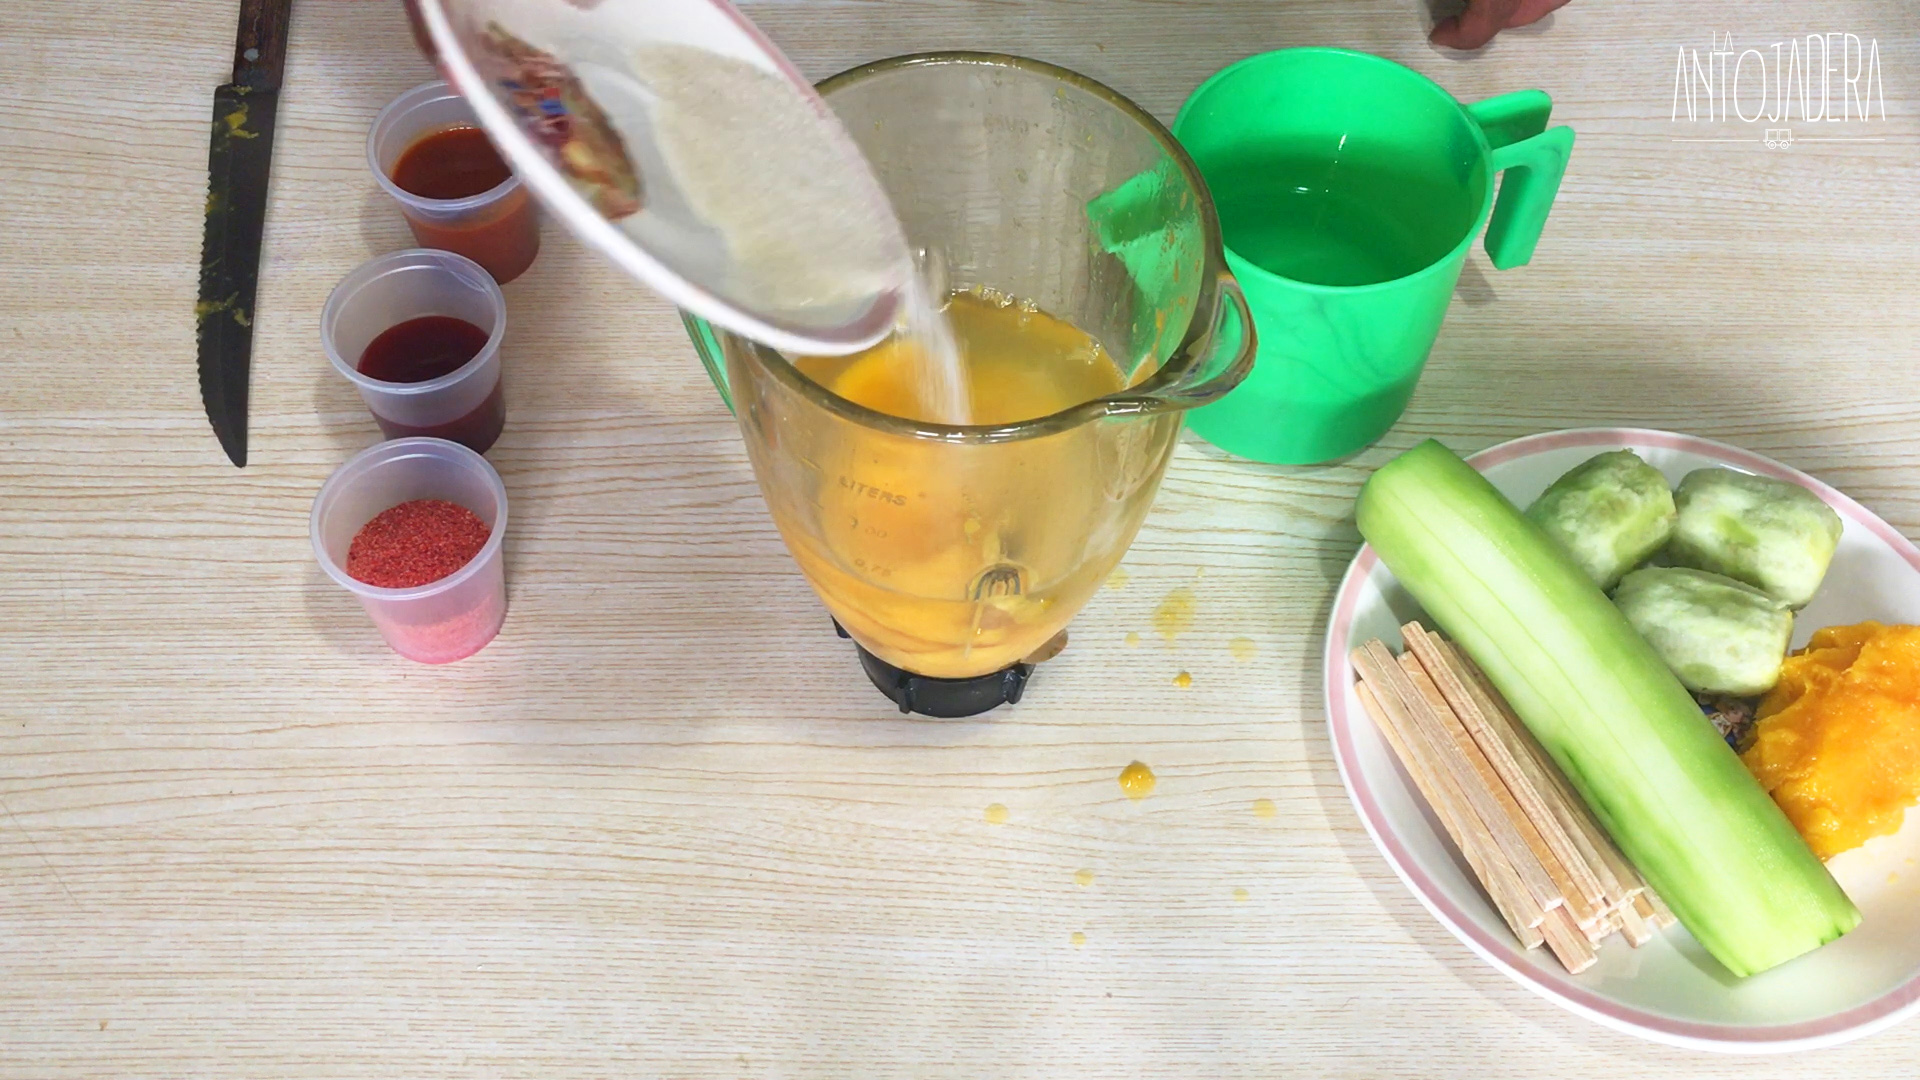 La Antojadera | Chamoyada de Mango